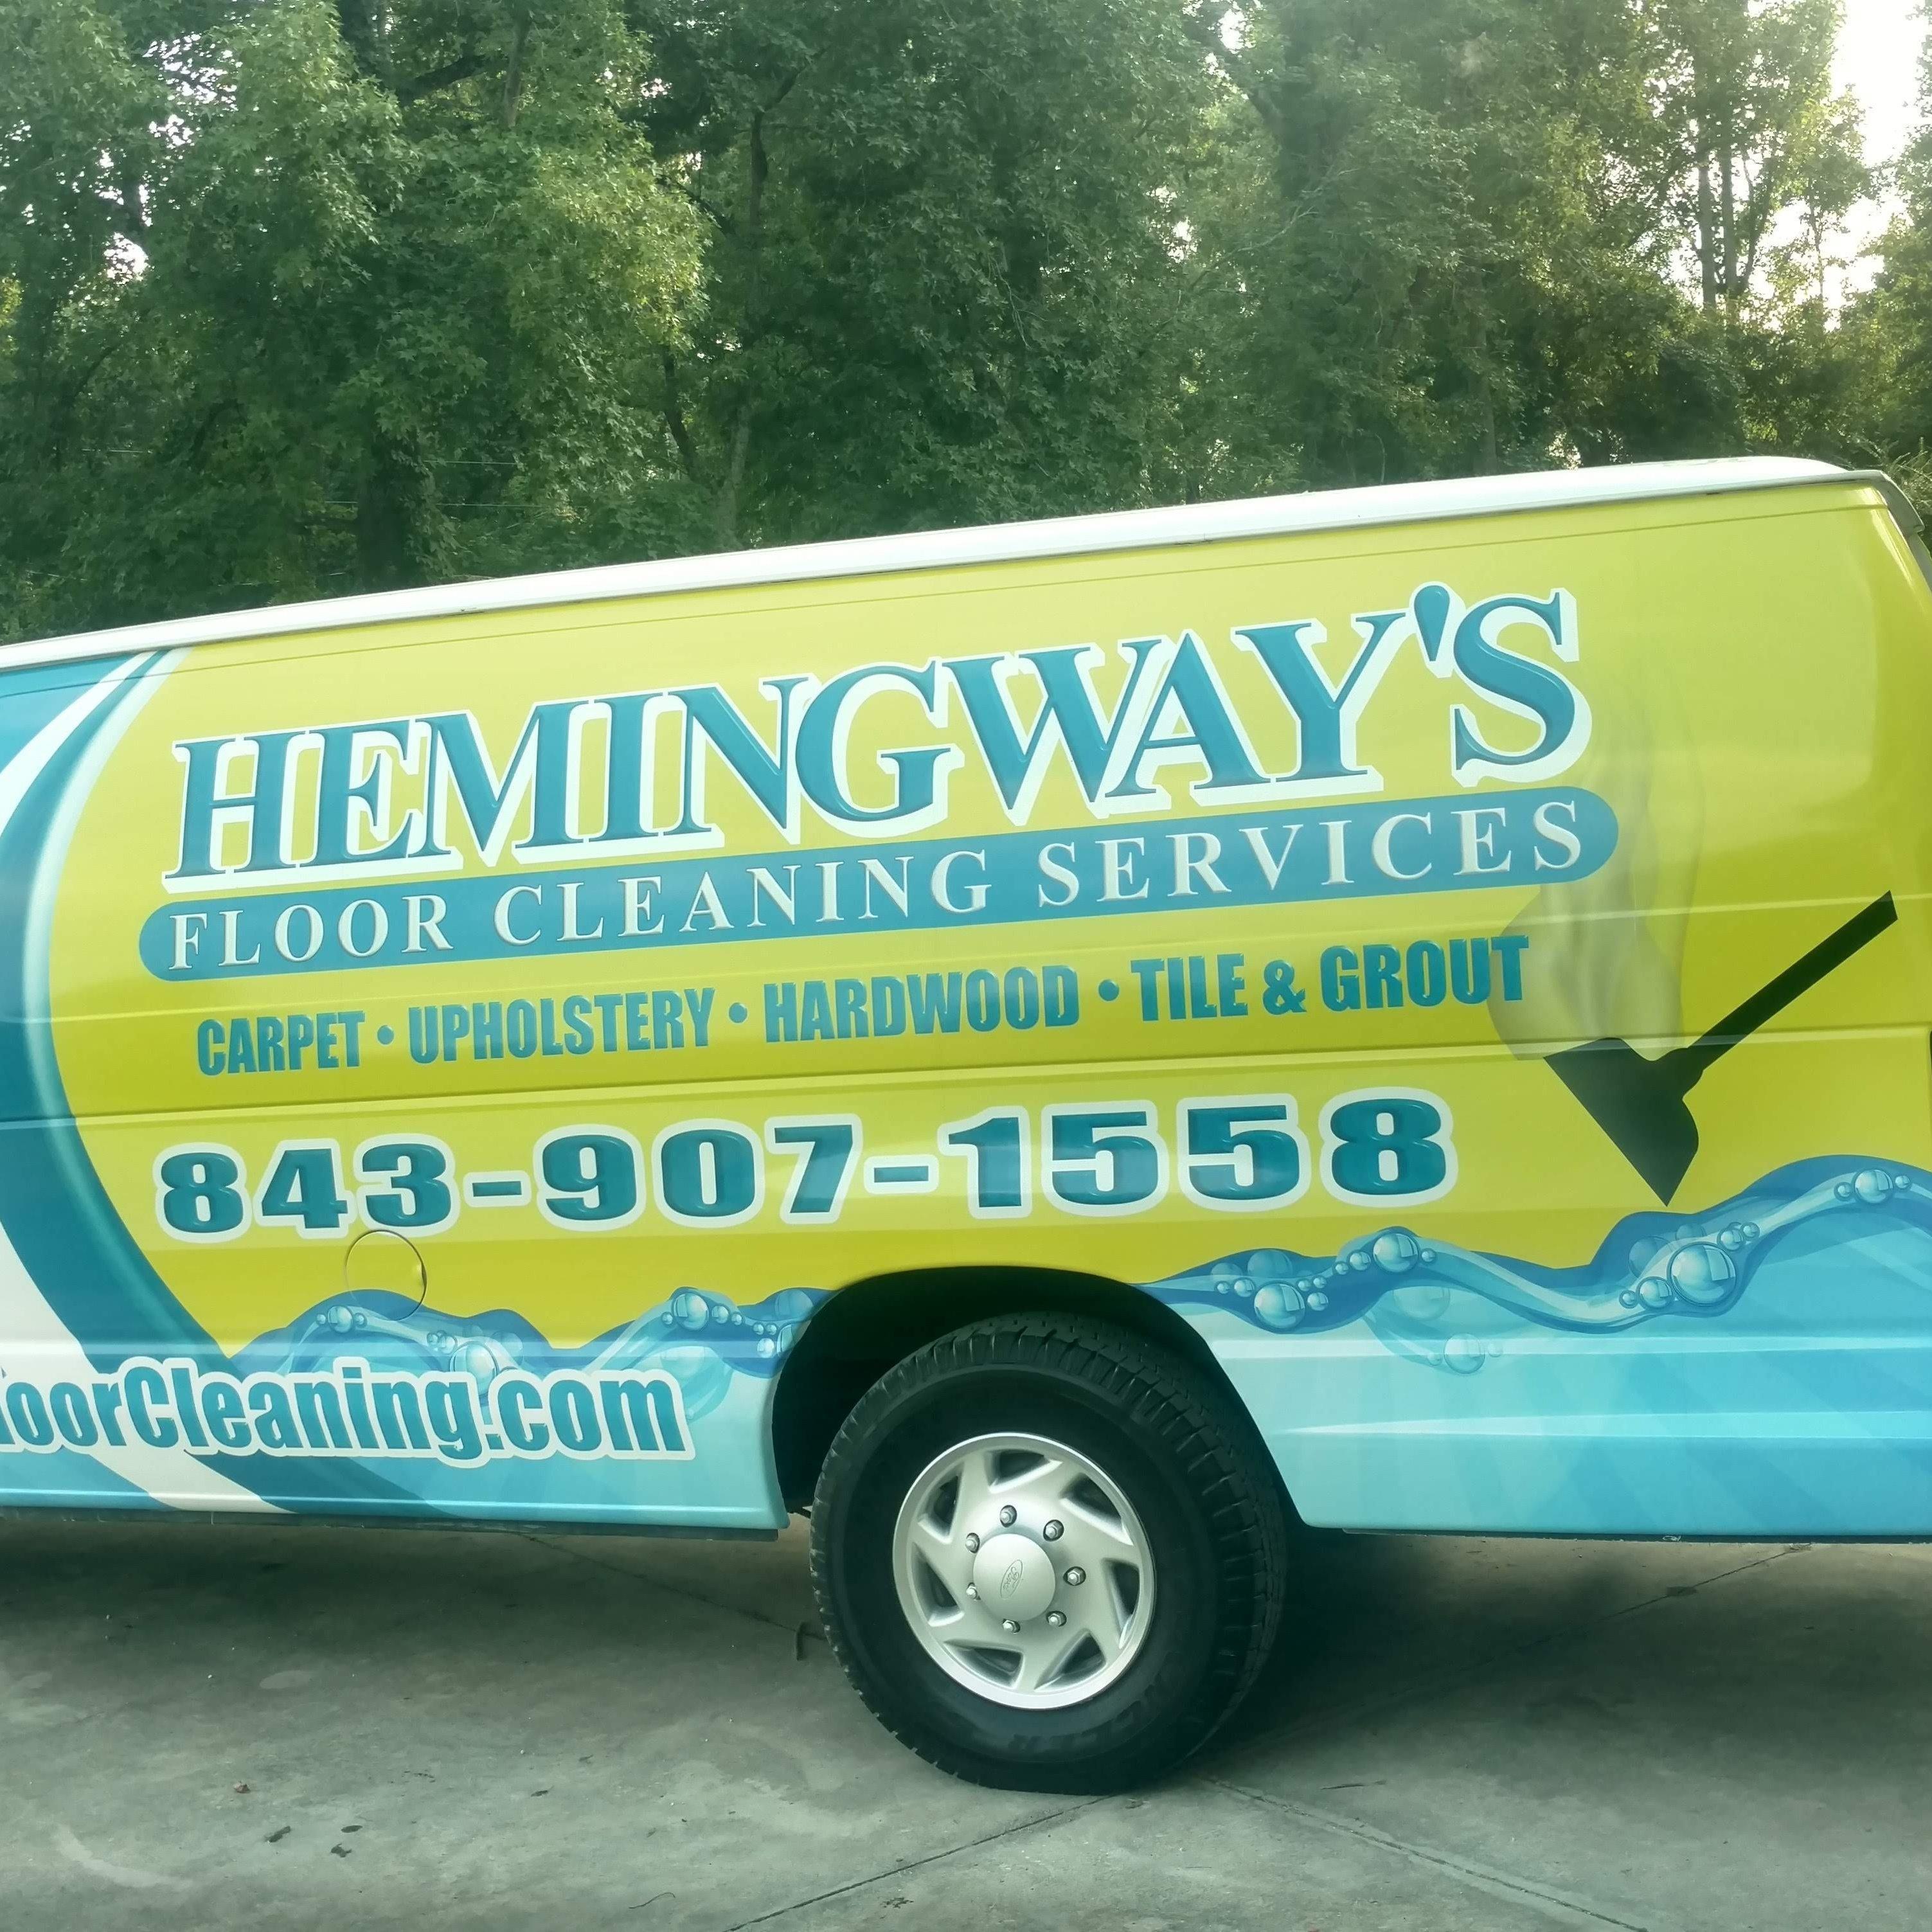 Hemingway's Floor Cleaning Service LLC